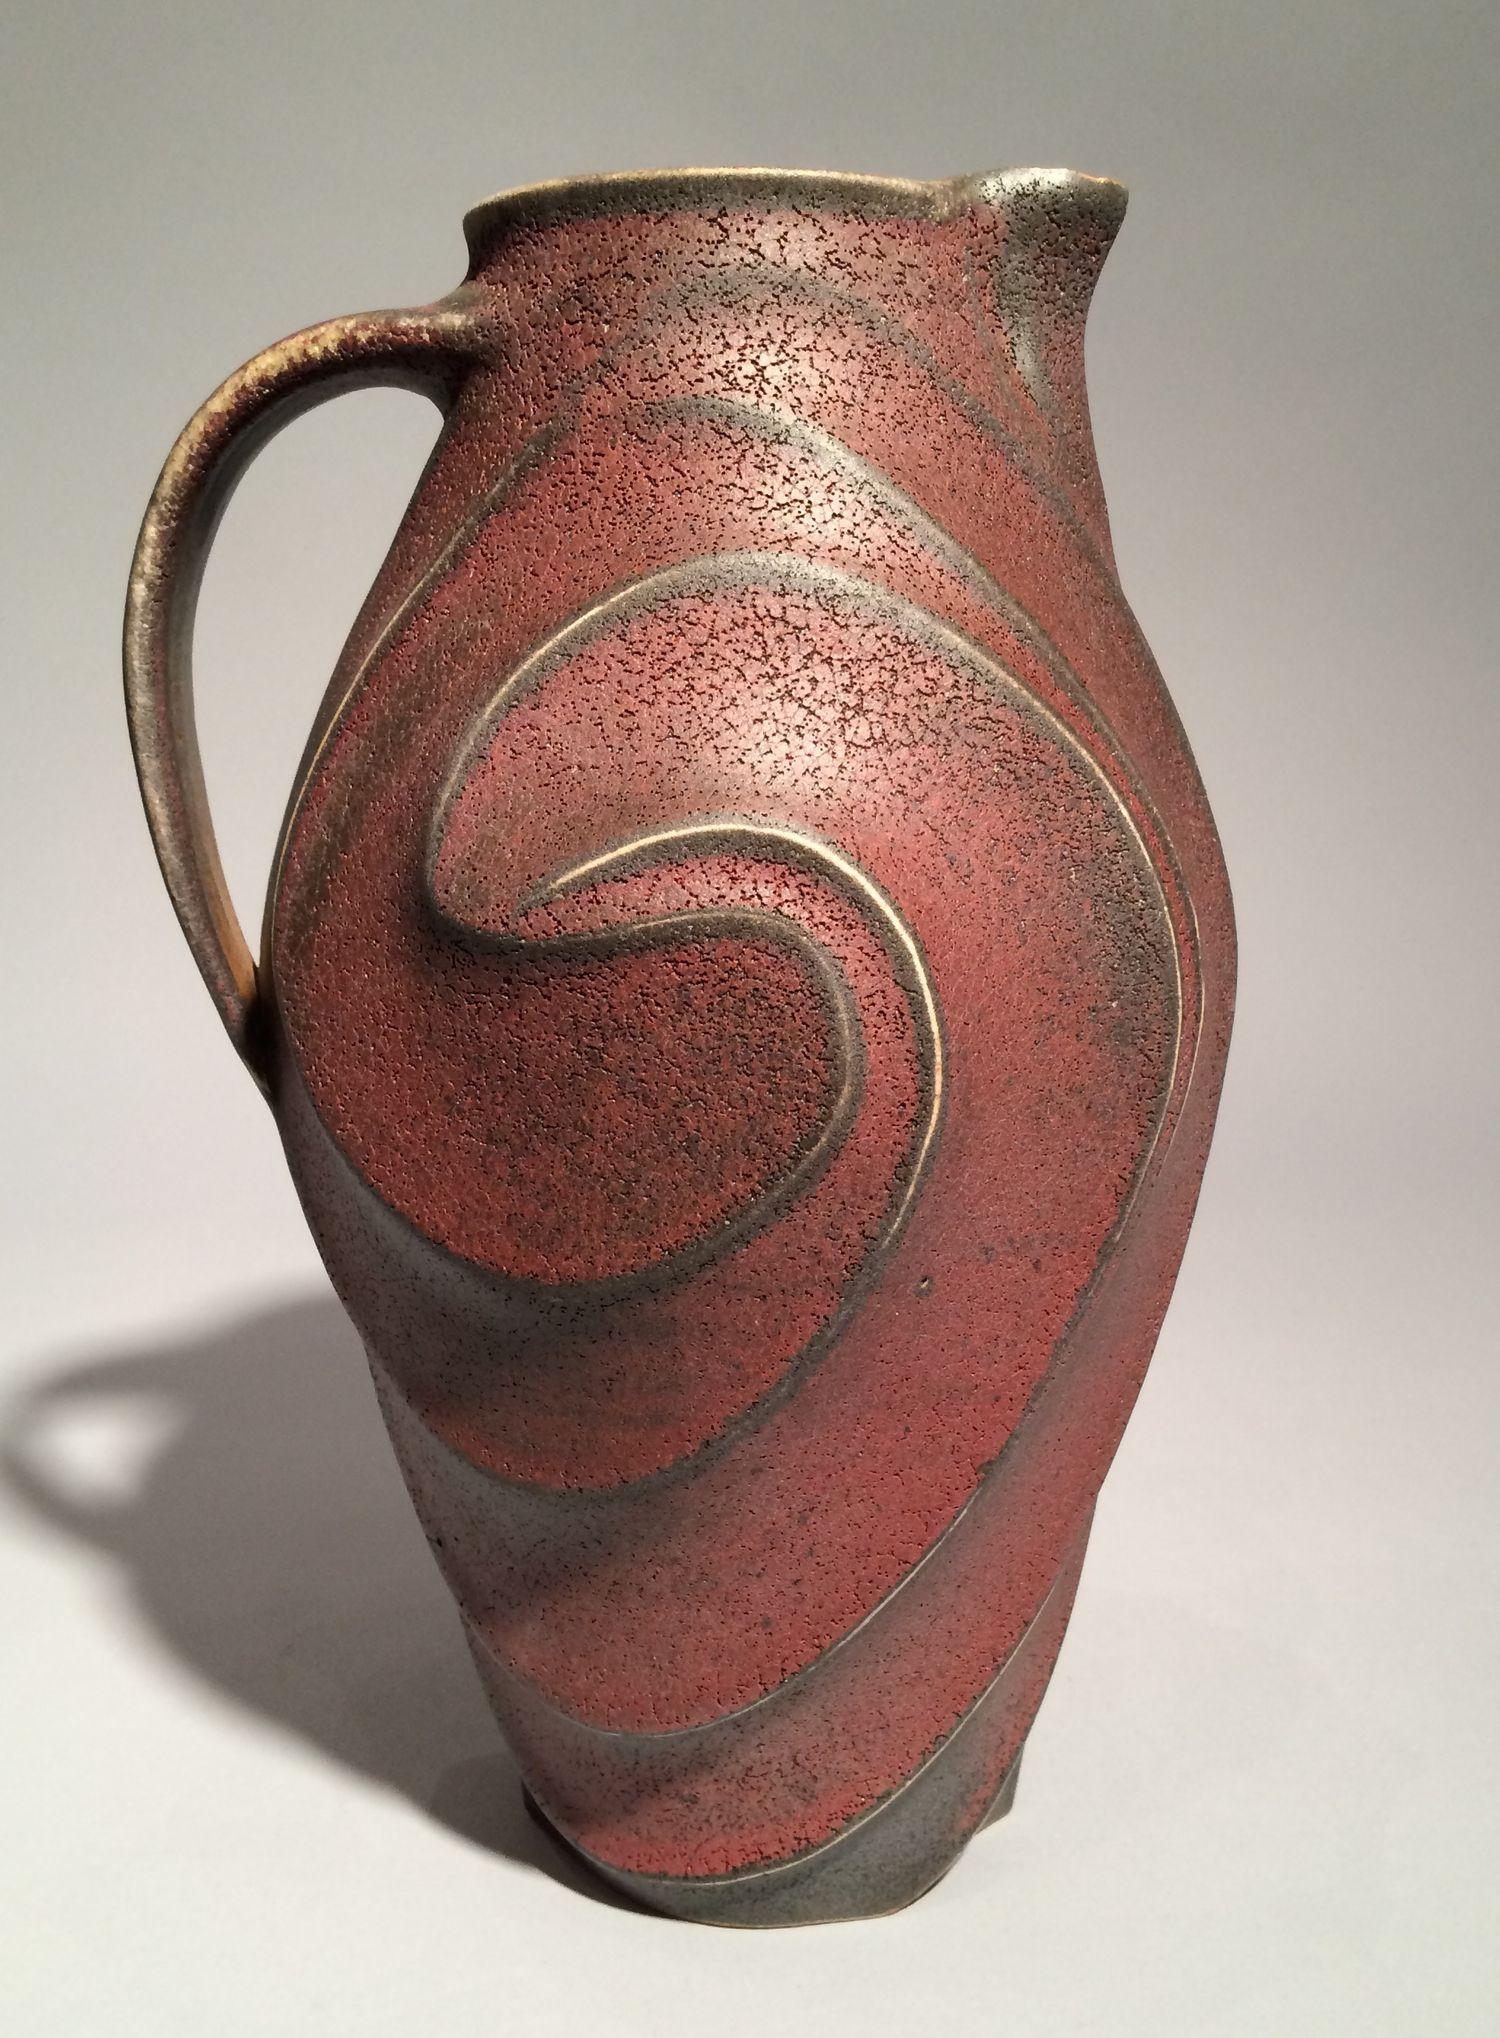 Porcelain Pitcher By Lin Xu Ceramic Pitcher Artful Home Ceramic Ware Ceramic Pitcher Pottery Pitcher